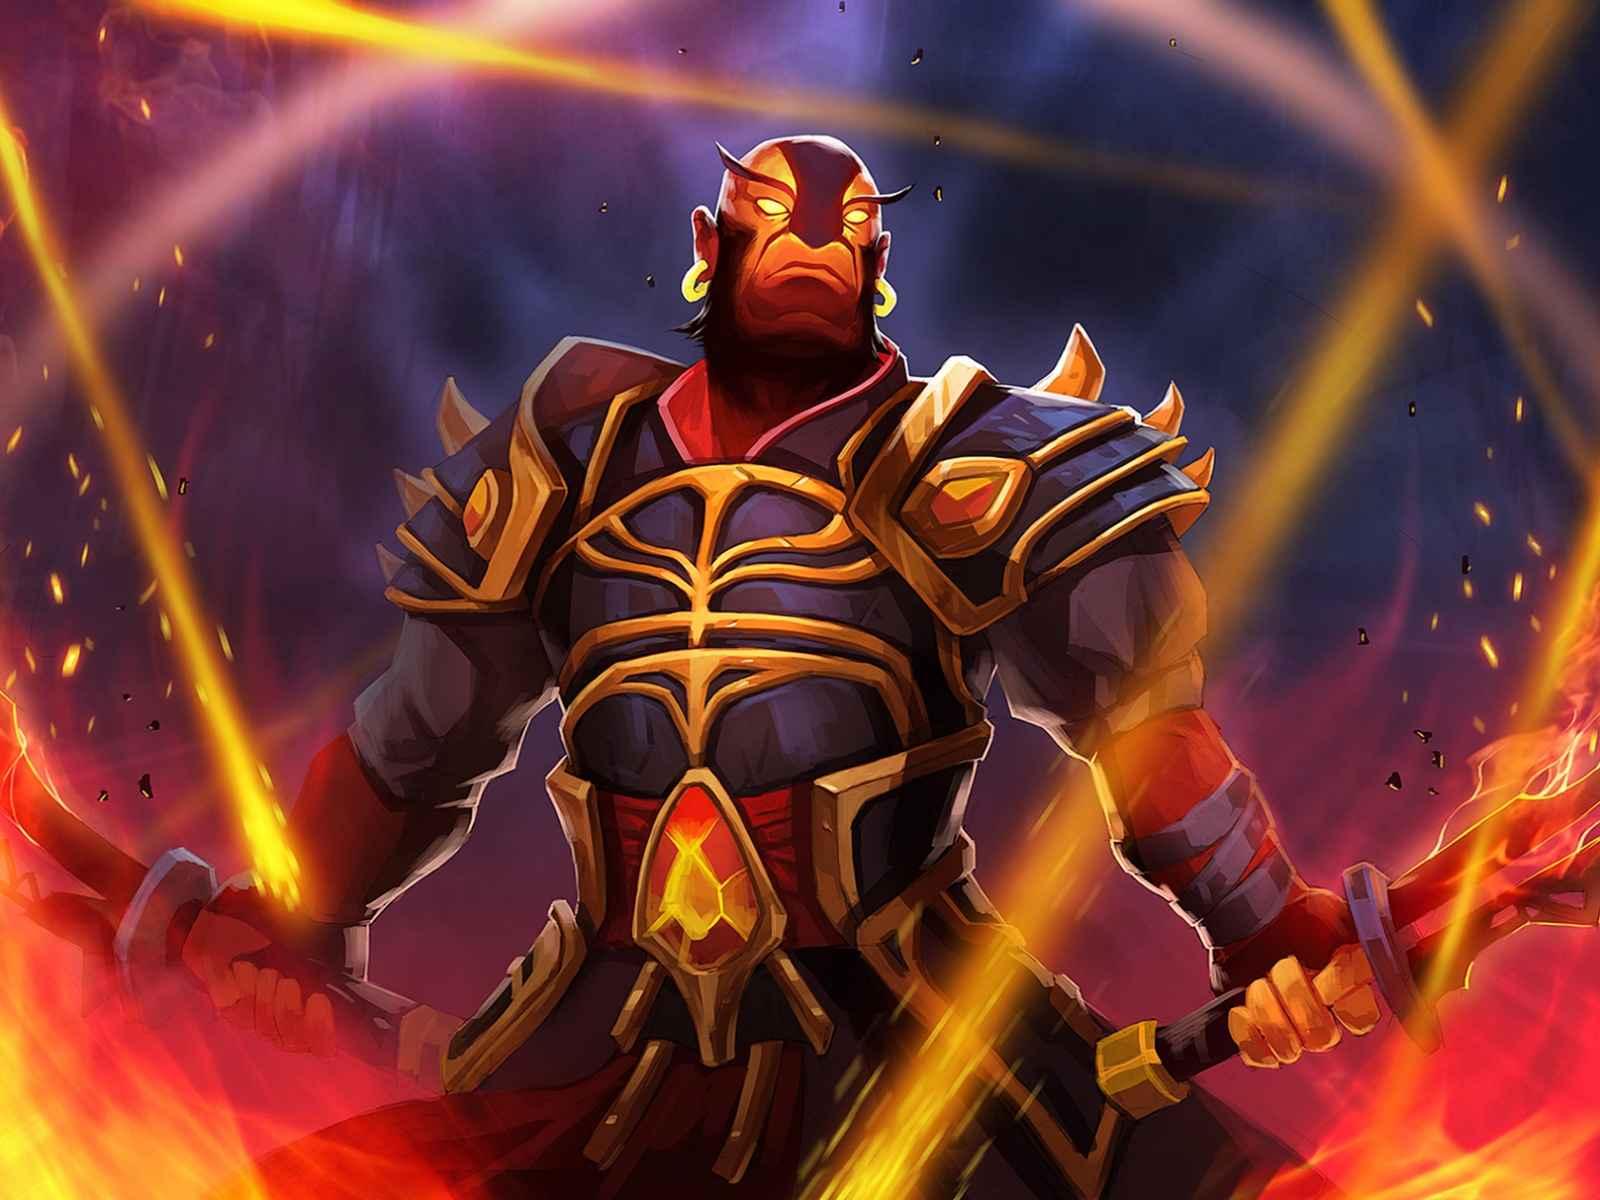 Dota 2, Ember spirit, Armor, Swords, Fire 1600×1200 HD Background